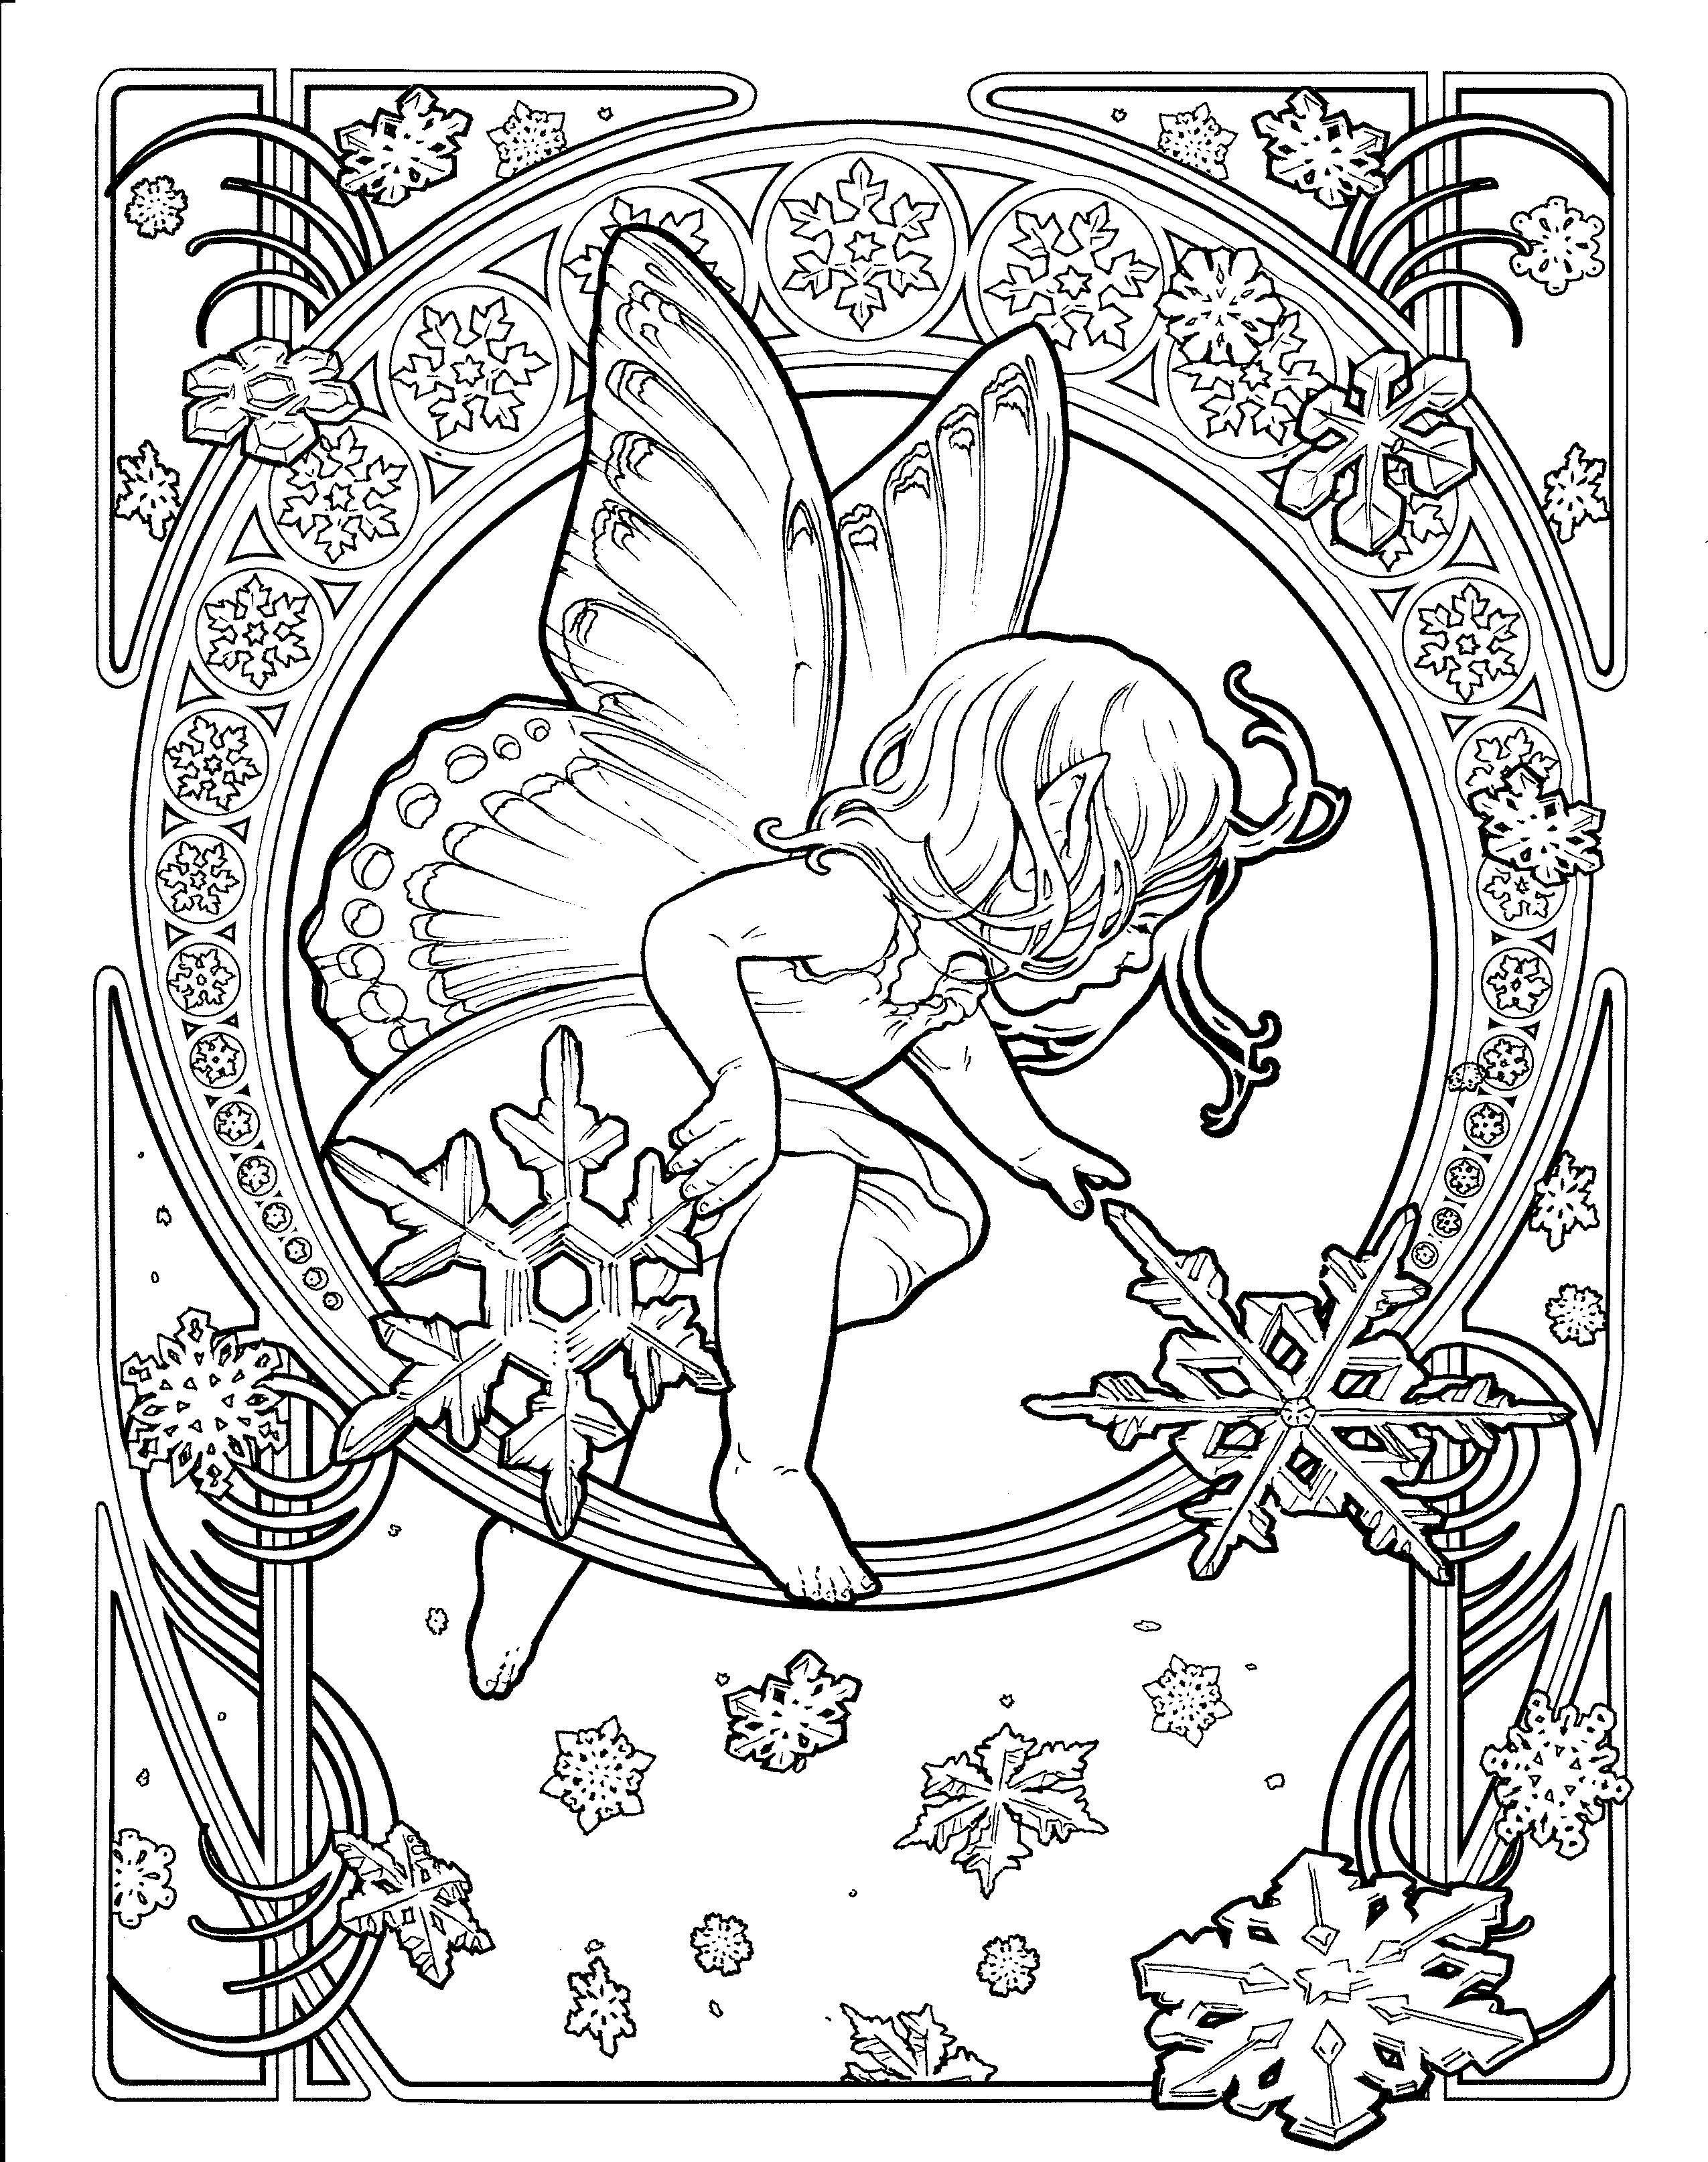 Pin By Brenda Mendenhall On Art I Like Coloring Pages Christmas Coloring Pages Colouring Pages